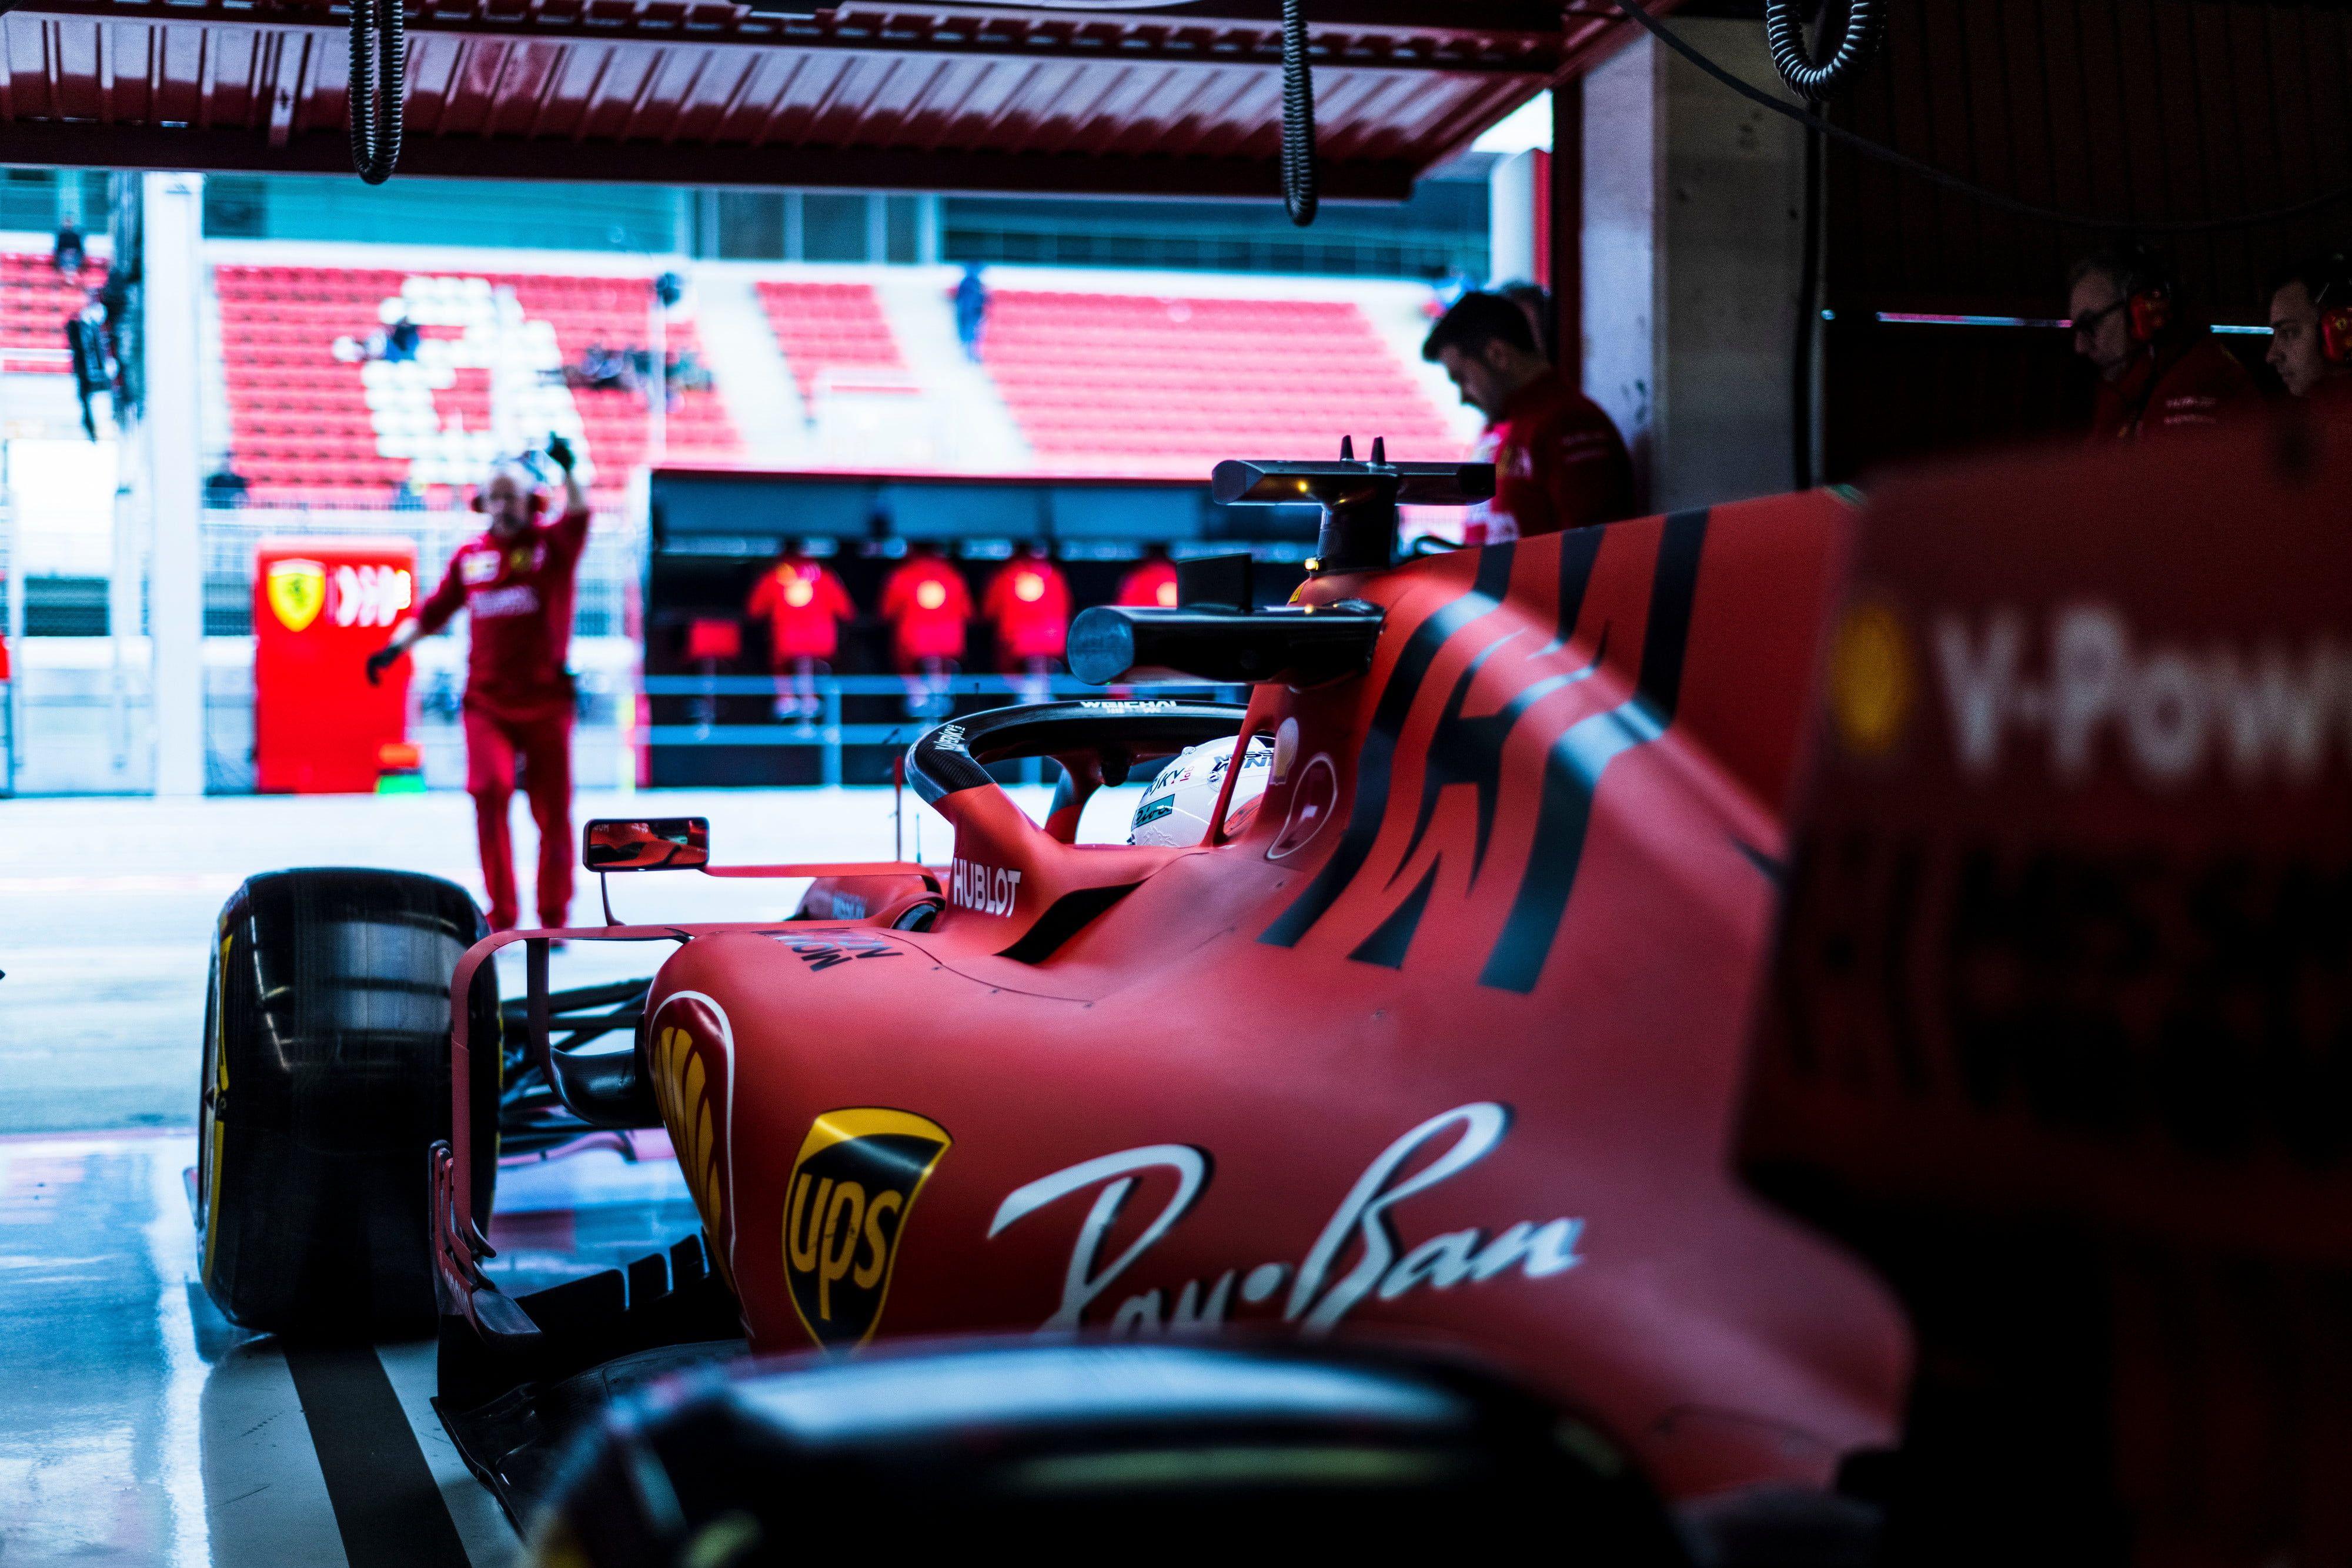 Ferrari Formula 1 Sebastian Vettel 2019 4k Wallpaper Hdwallpaper Desktop In 2020 Formula 1 Ferrari Sports Wallpapers